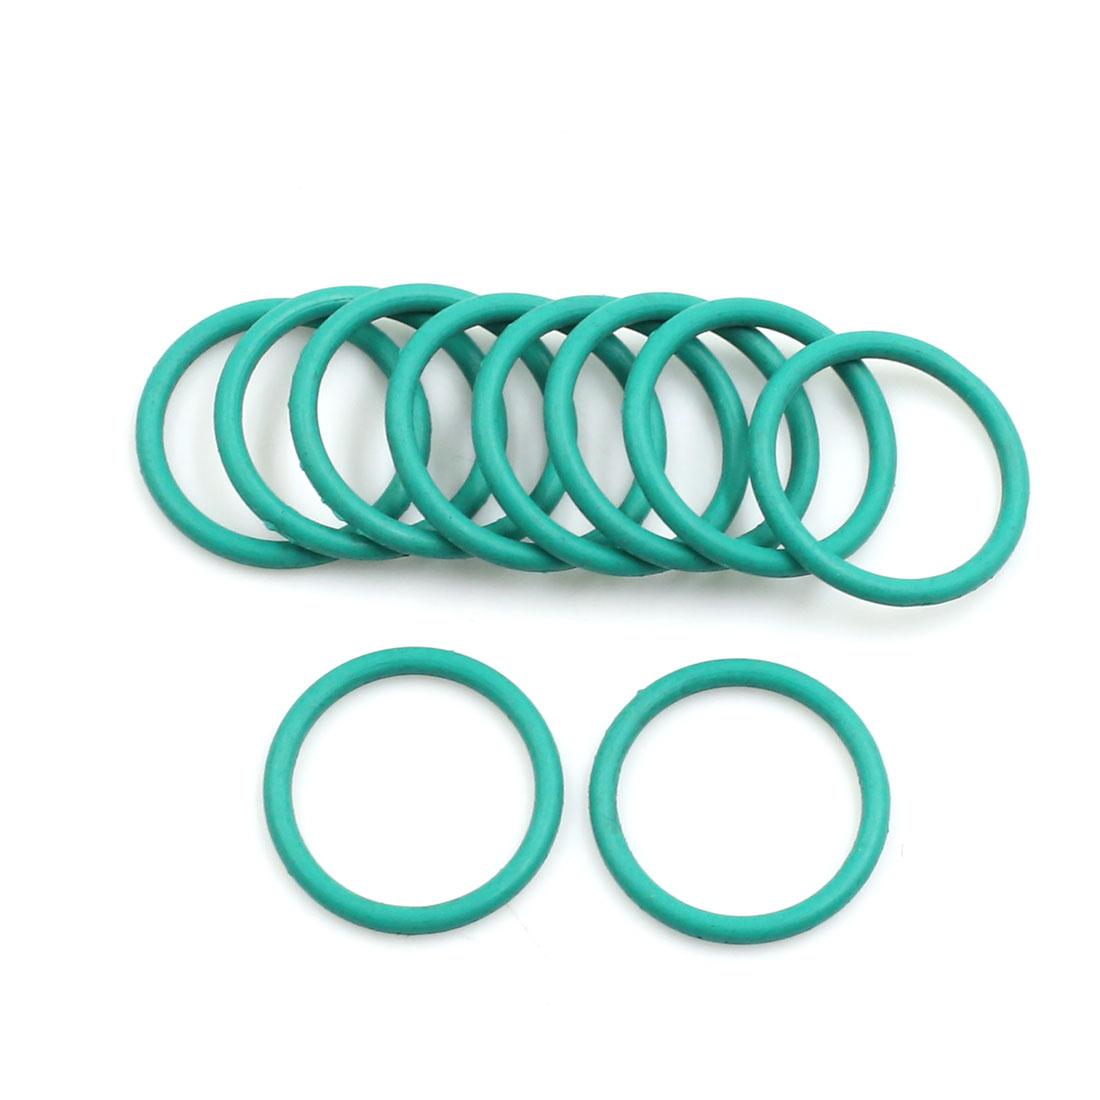 10pcs Green Universal FKM O-Ring Sealing Gasket Washer for Car 20mm x 2mm